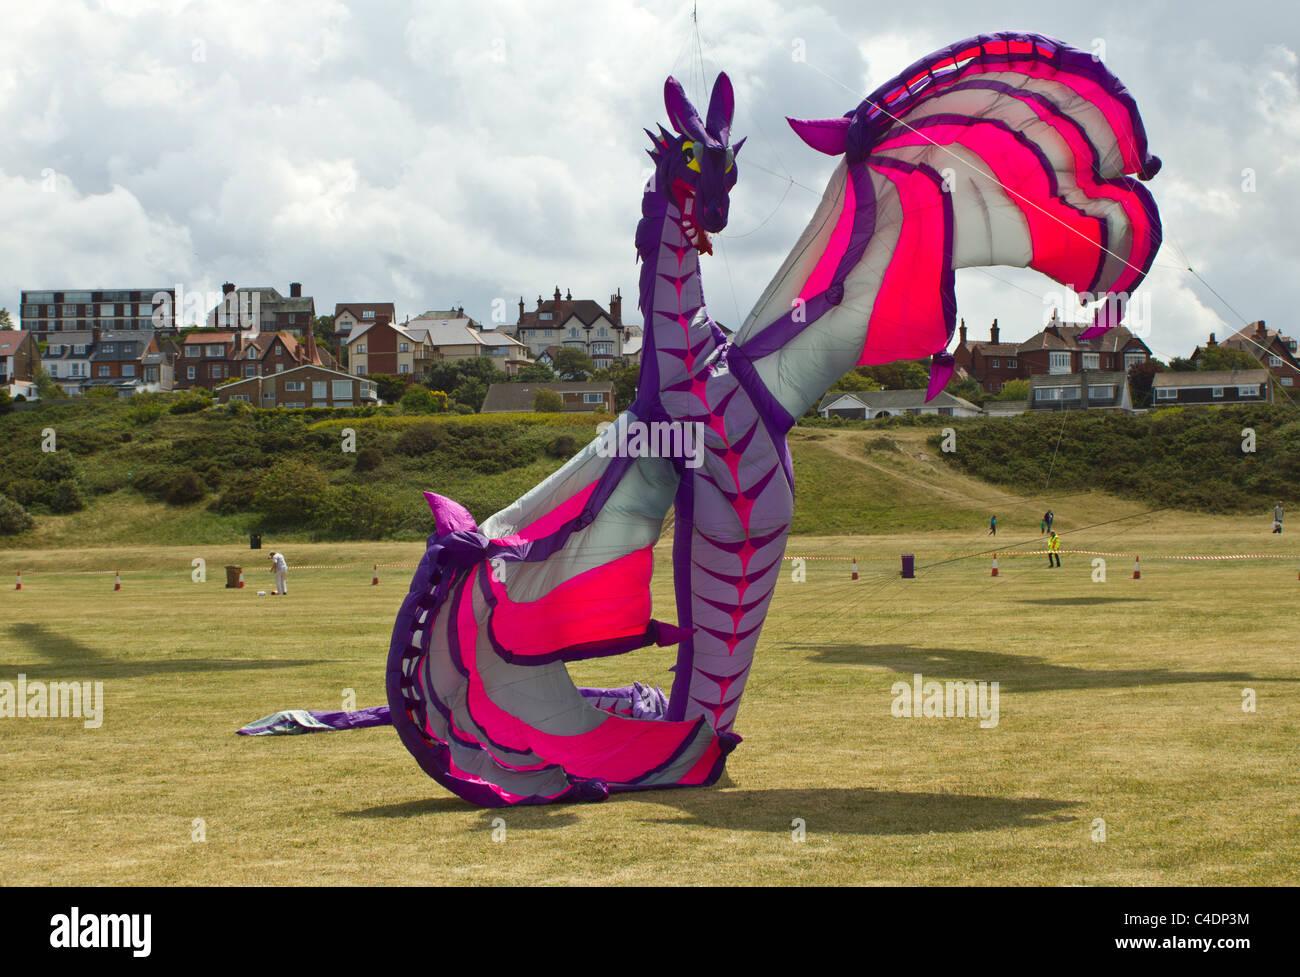 Giant Inflatable Dragon Kite